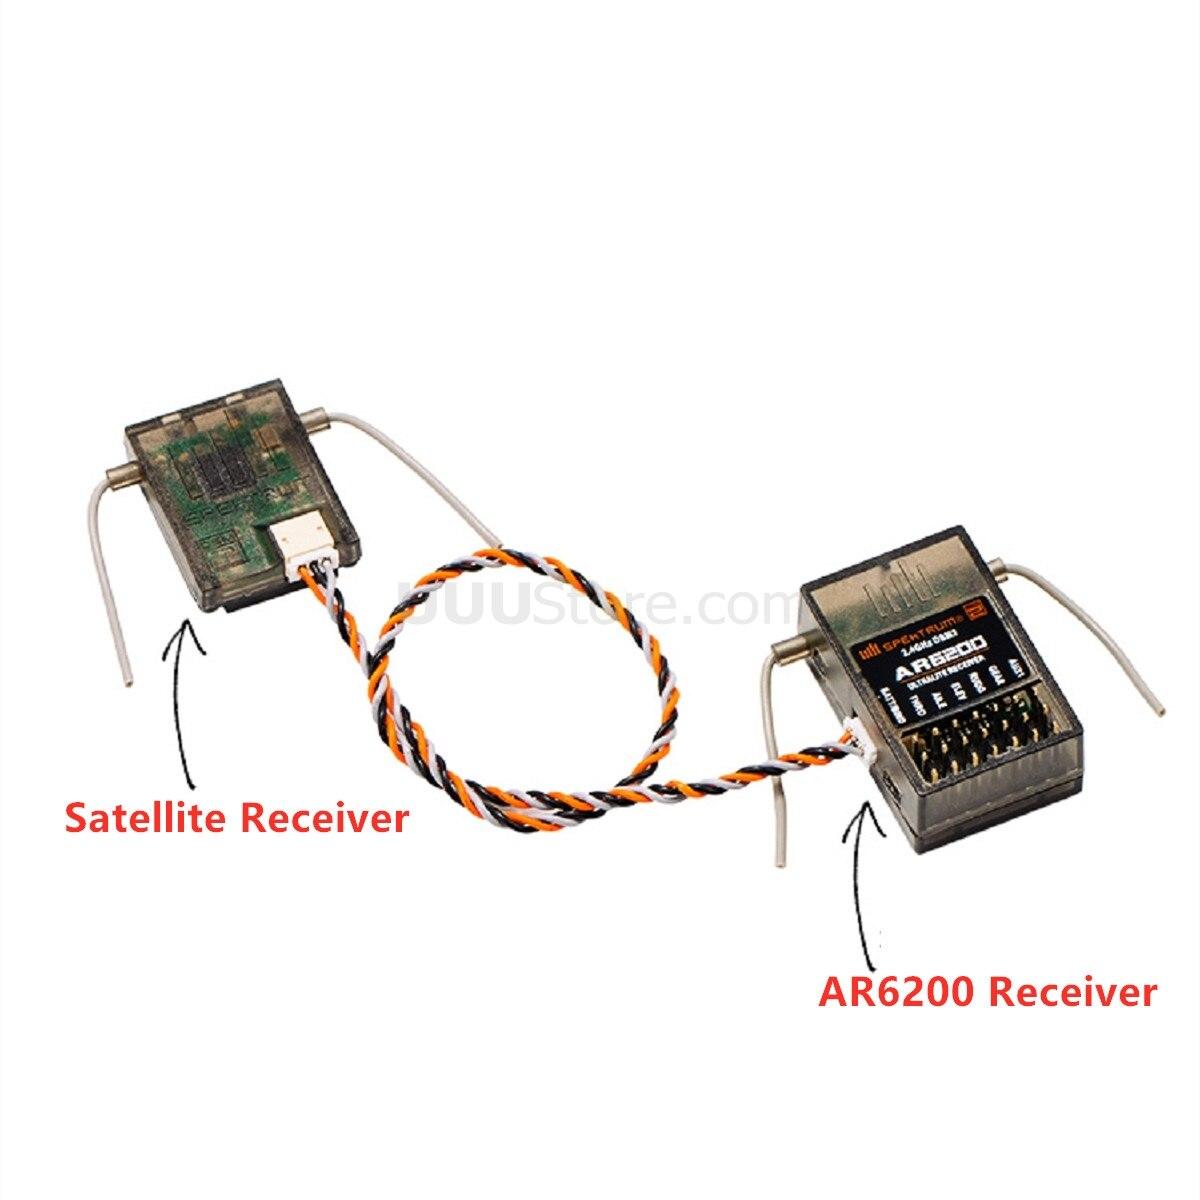 Spektrum AR6200 With 2.4GHz Self-frequency Satellite Receiver For DSMX DSM2 11MS 22MS WALKERA Devo 7E 10 8s 12s RC Drone Diy Toy